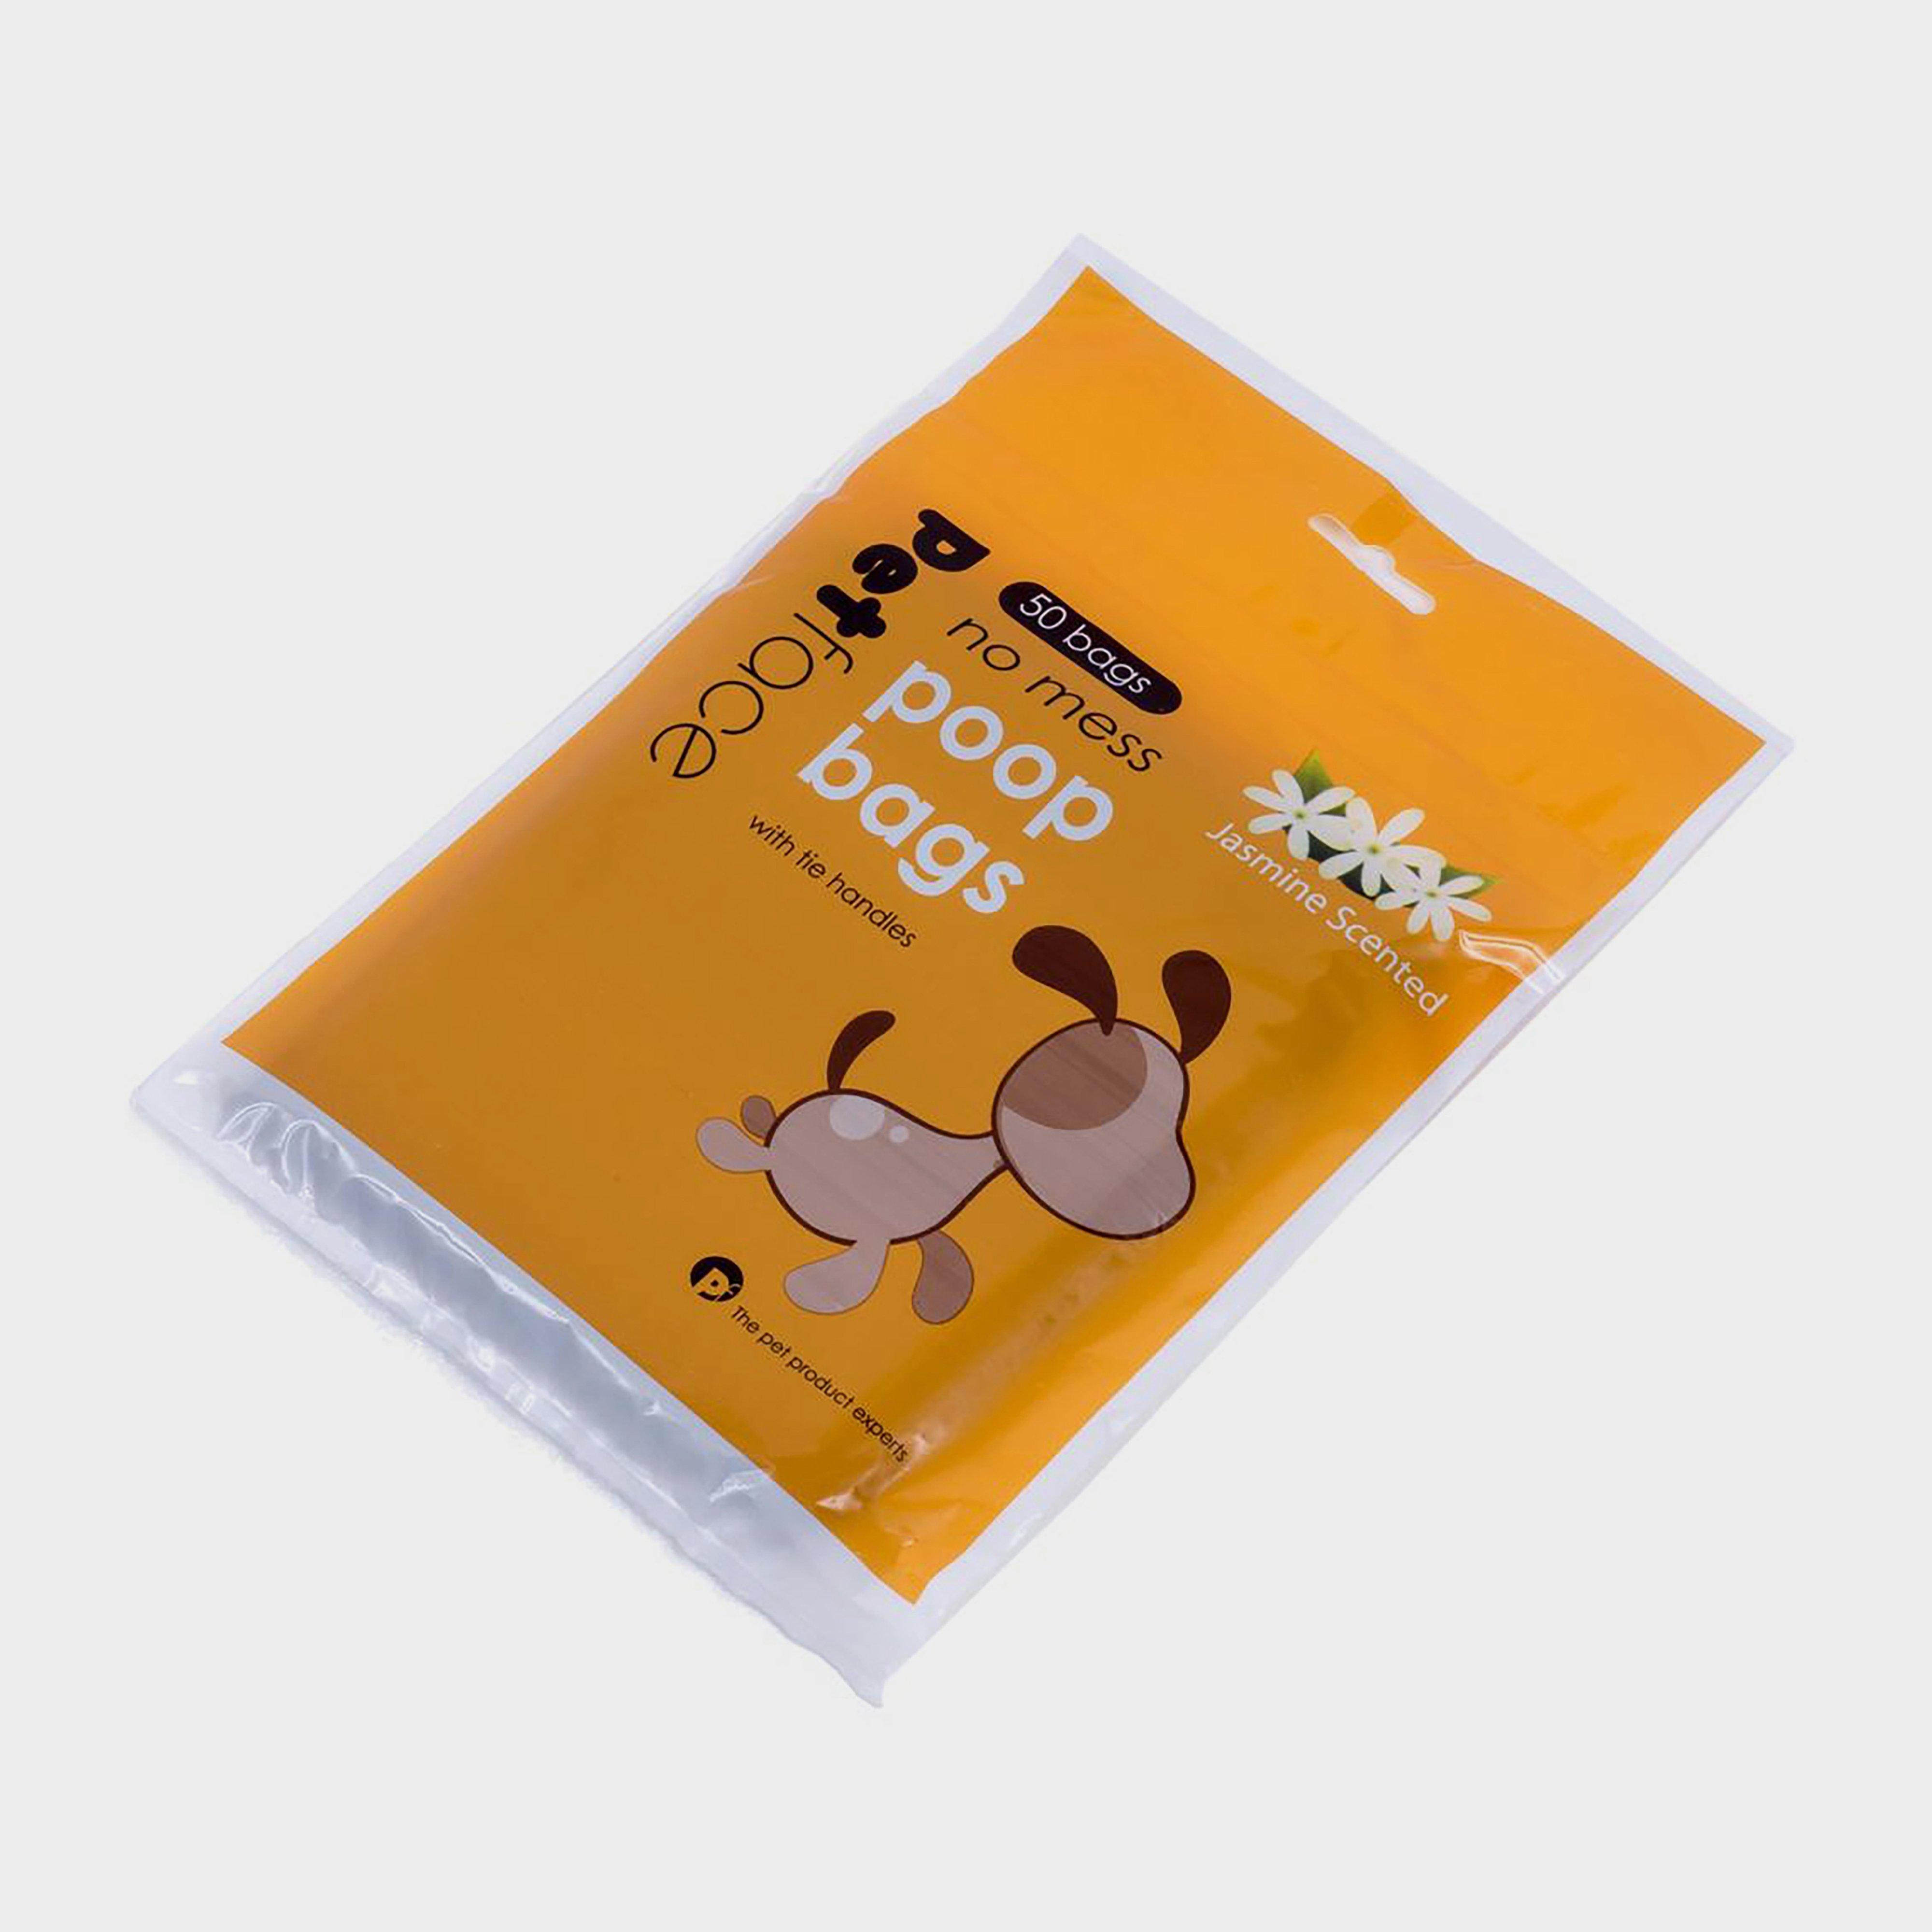 Image of Petface 50 Pack Degradable Dog Poop Bag - No Colour/No Colour, No Colour/No Colour